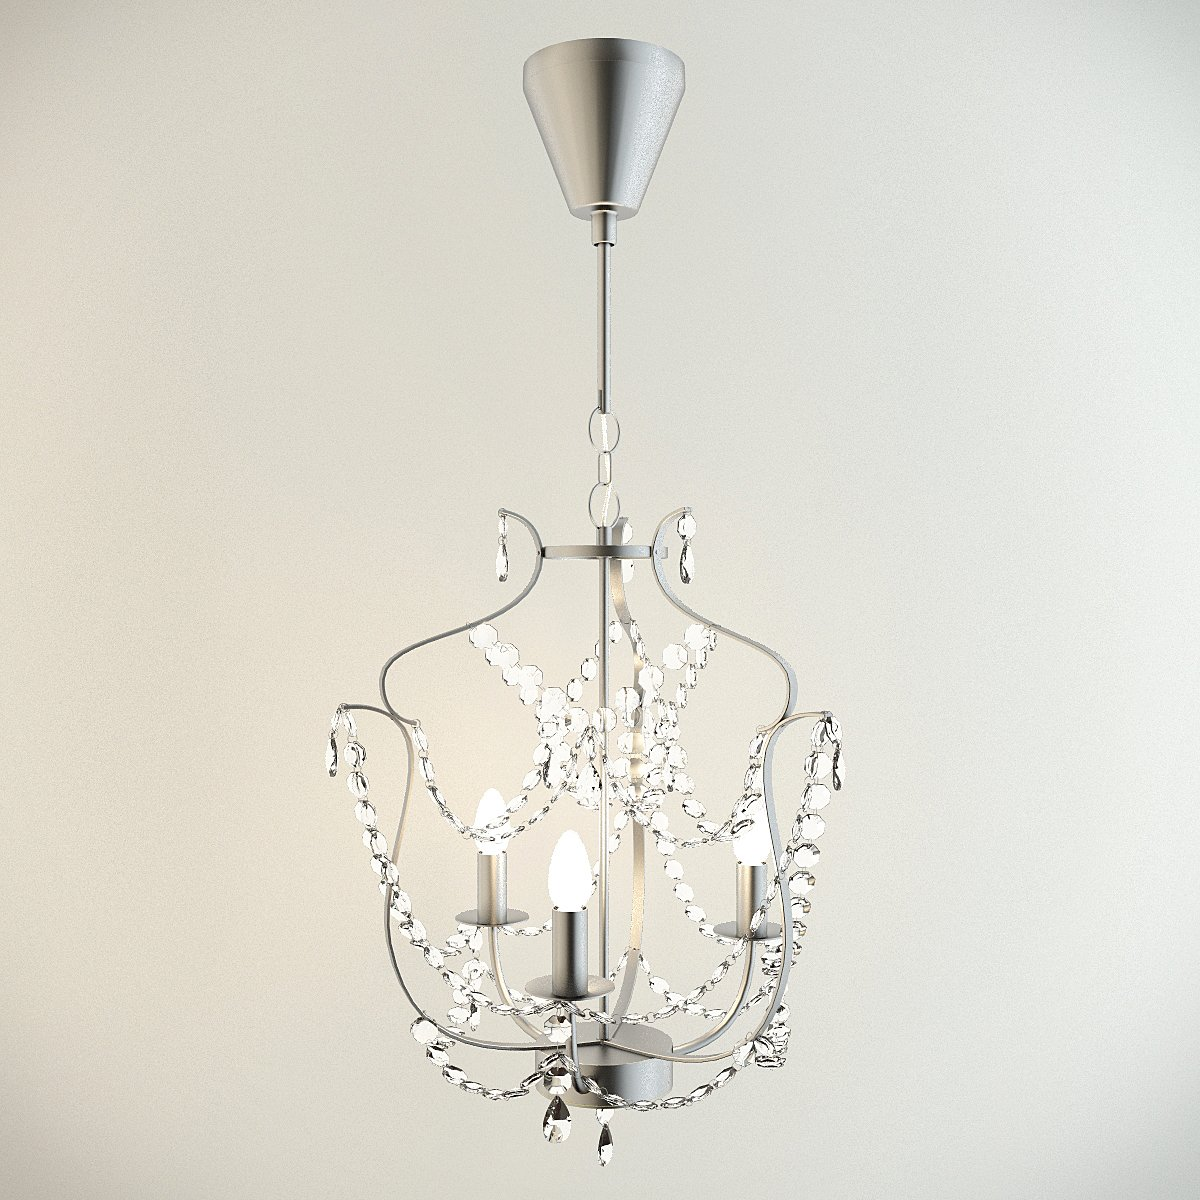 Ikea kristaller lamp modelo 3d in lmpara 3dexport aloadofball Gallery